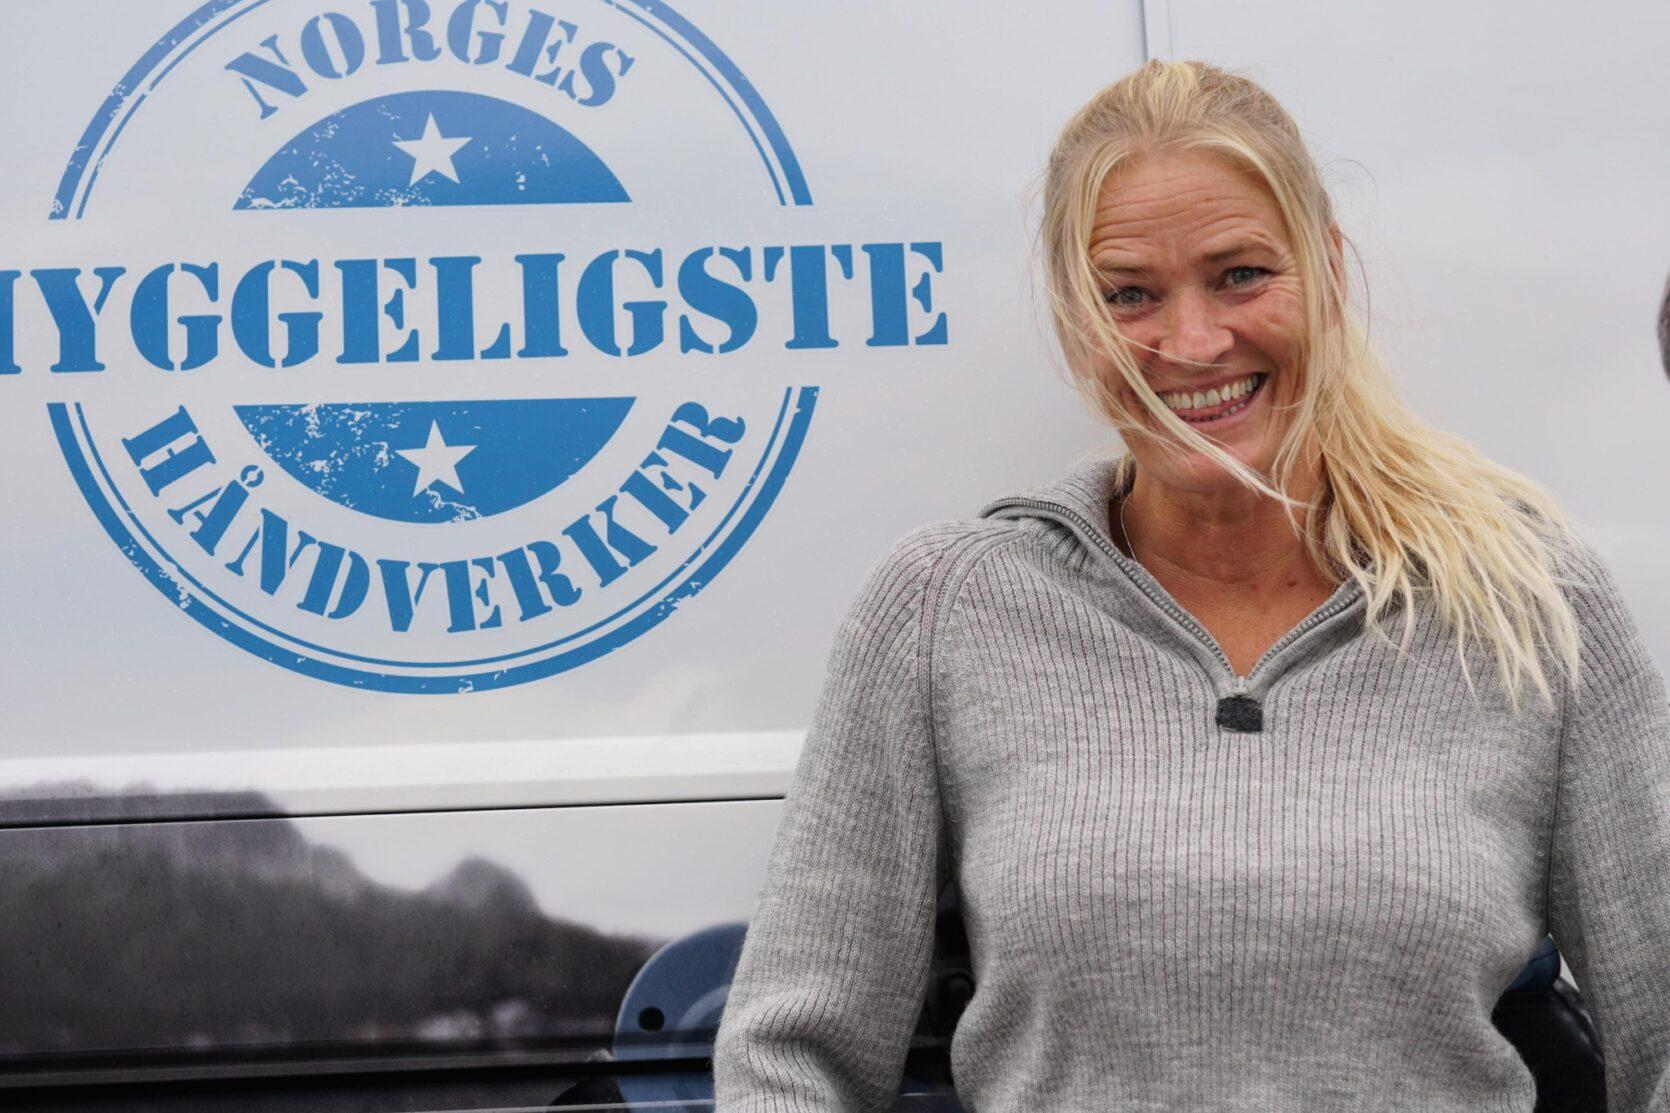 Snekker Linda Jensen foran logoen til Norges Hyggeligste Håndverker